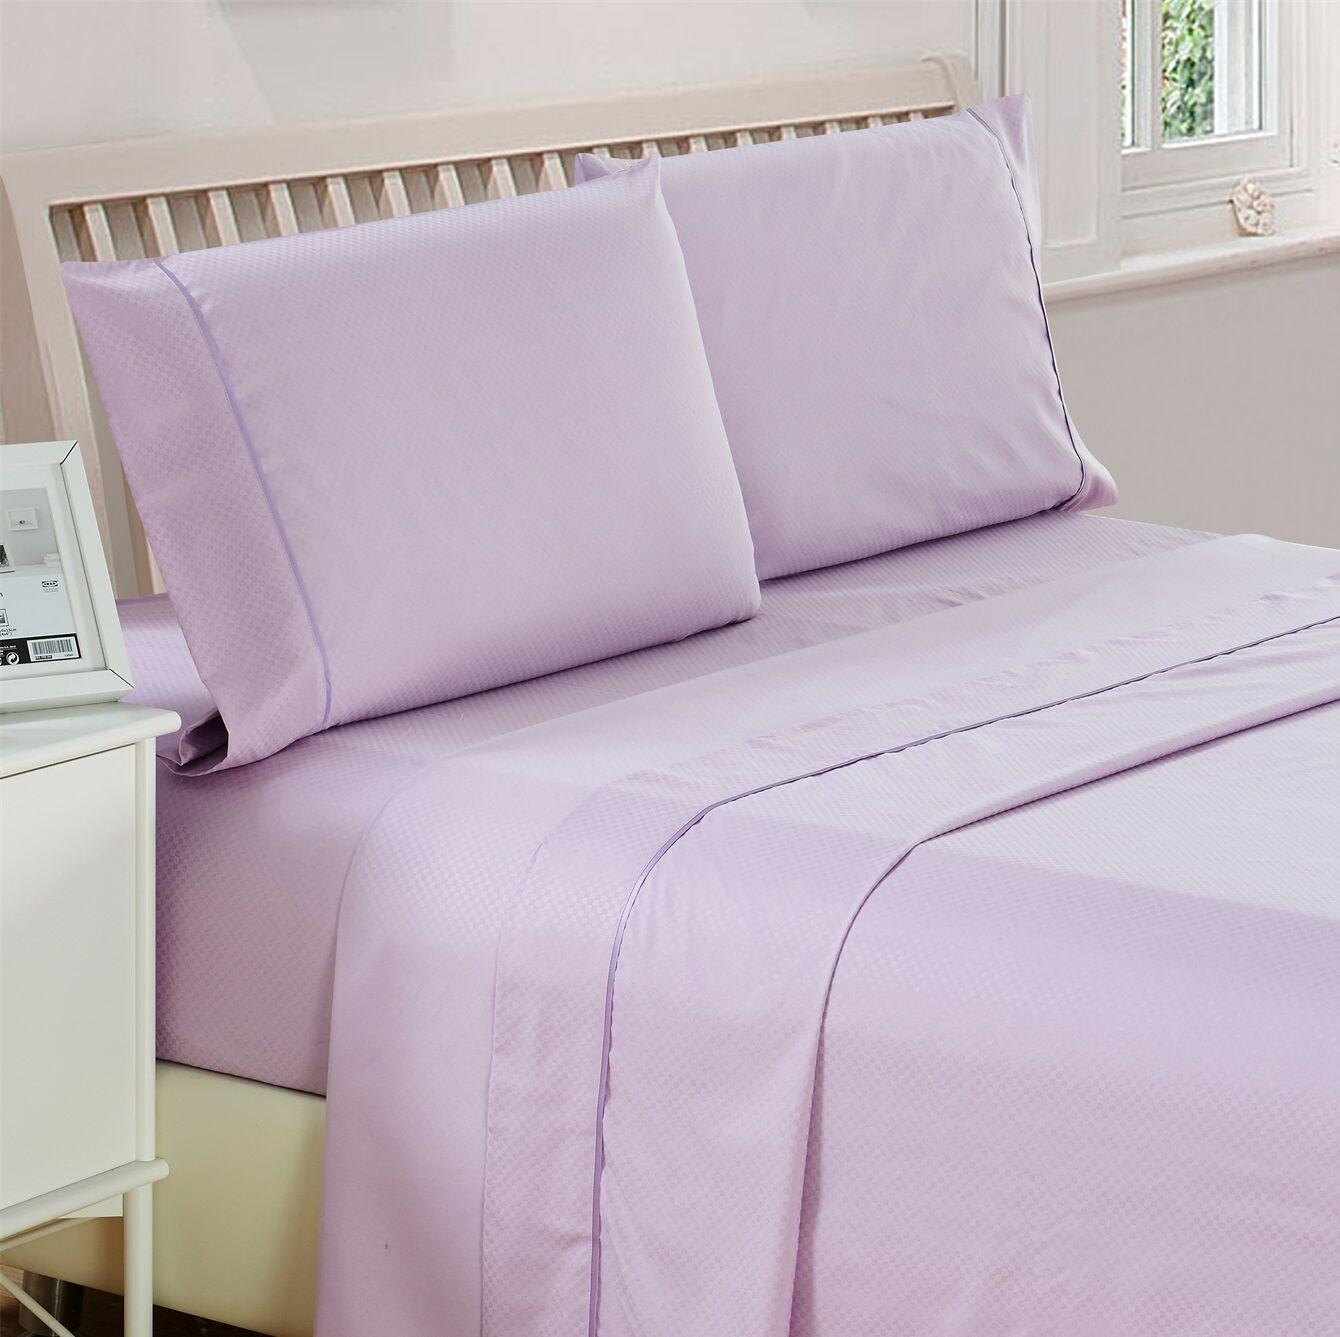 Raub Microfiber Blend Sheet Set Size: King, Color: Lavender